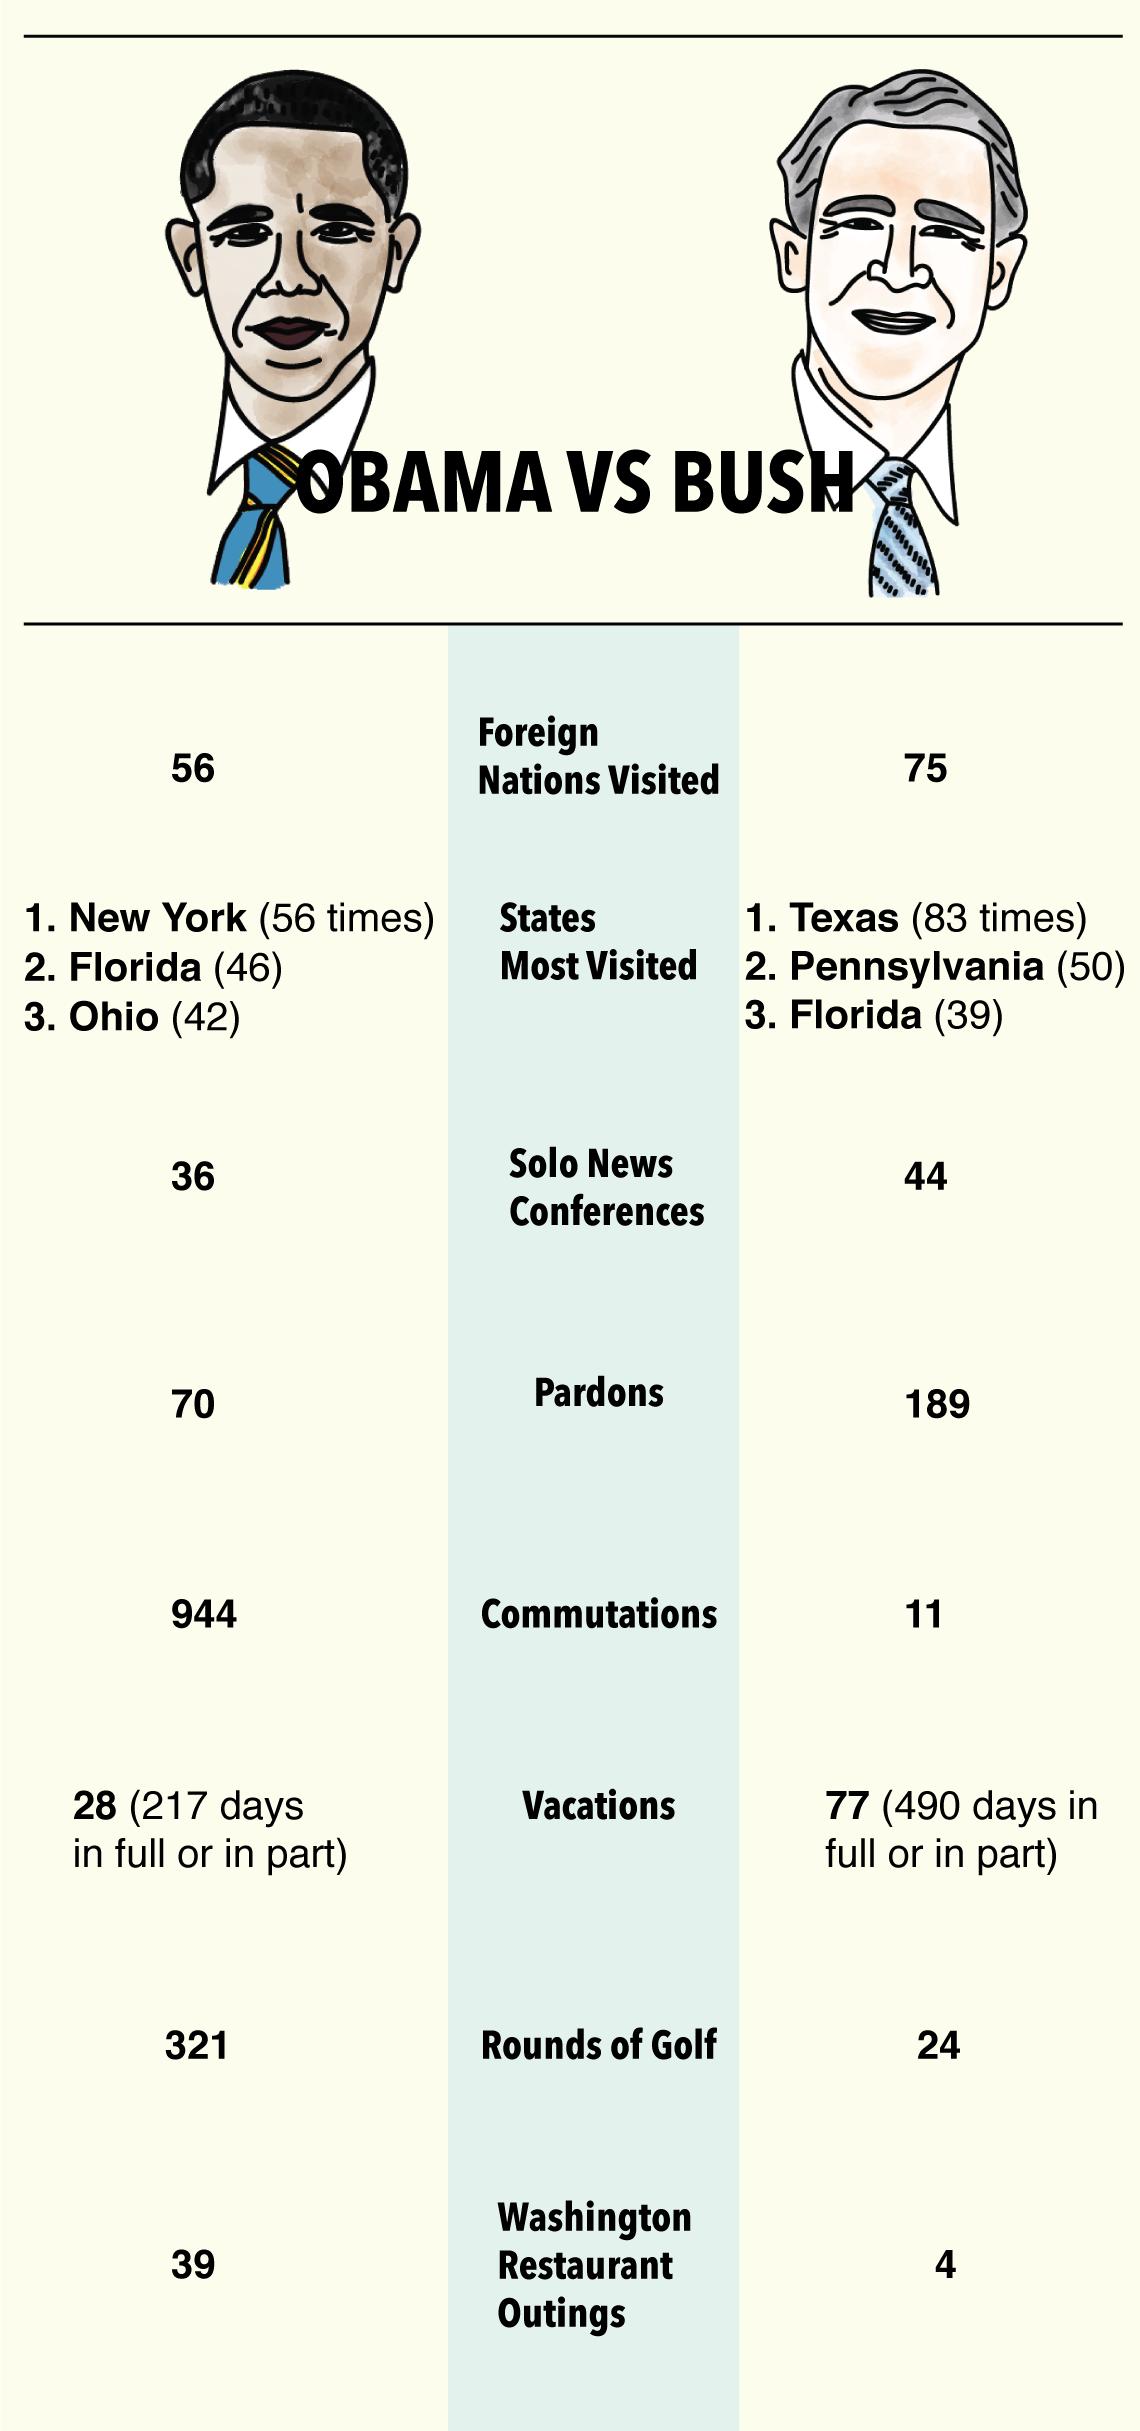 obama vs bush foreign policy